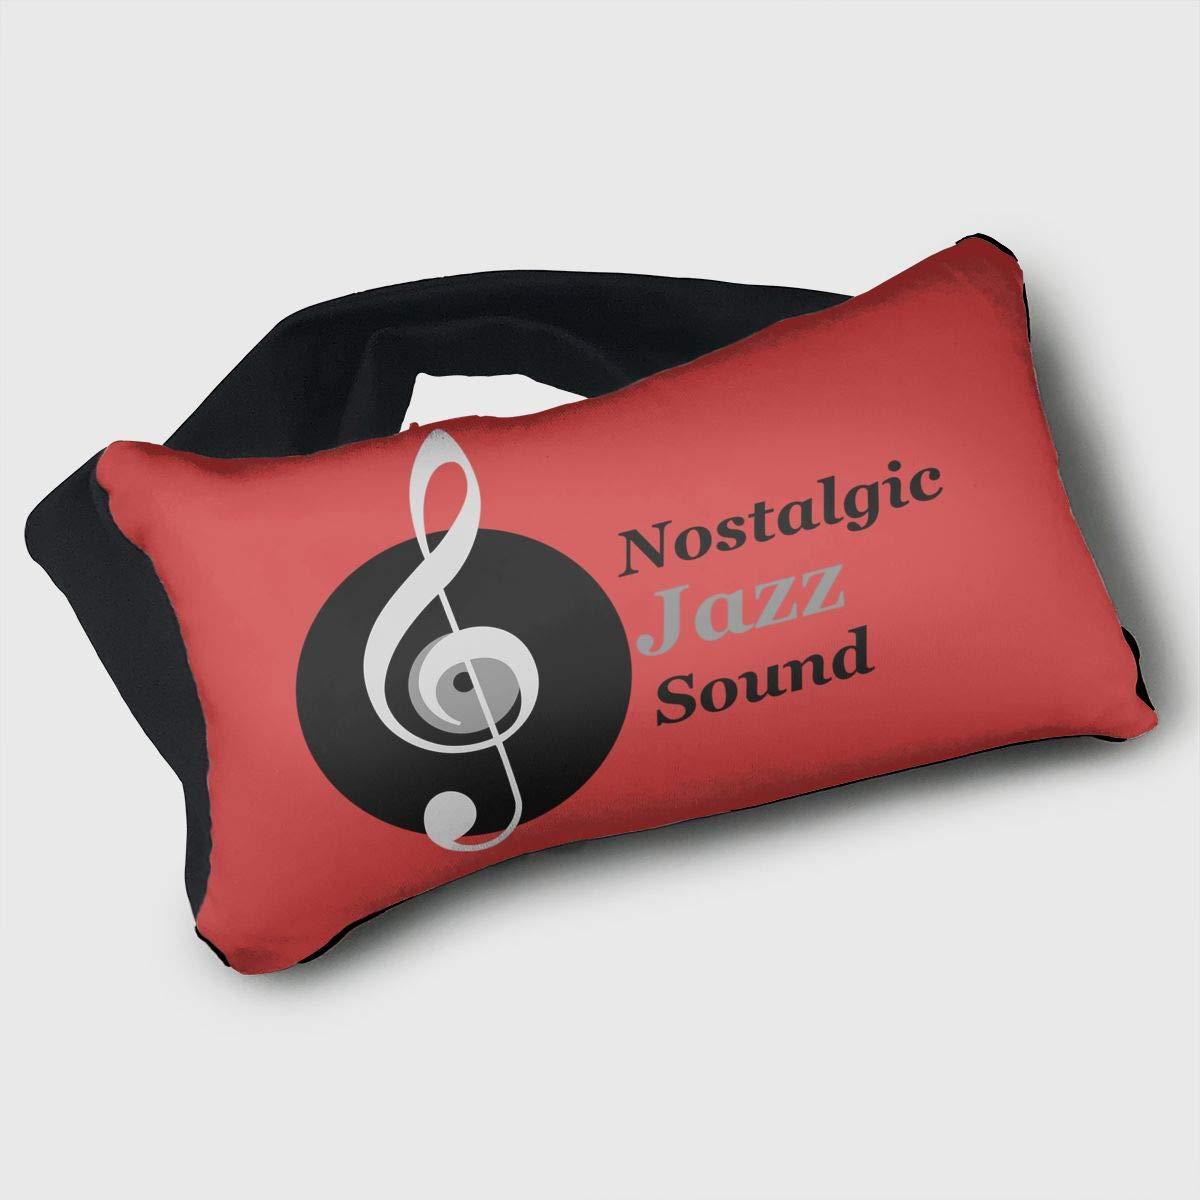 Voyage Travel Pillow Eye Mask 2 in 1 Portable Neck Support Scarf Nostalgic Jazz Sound Ergonomic Naps Rest Pillows Sleeper Versatile for Airplanes Car Train Bus Home Office